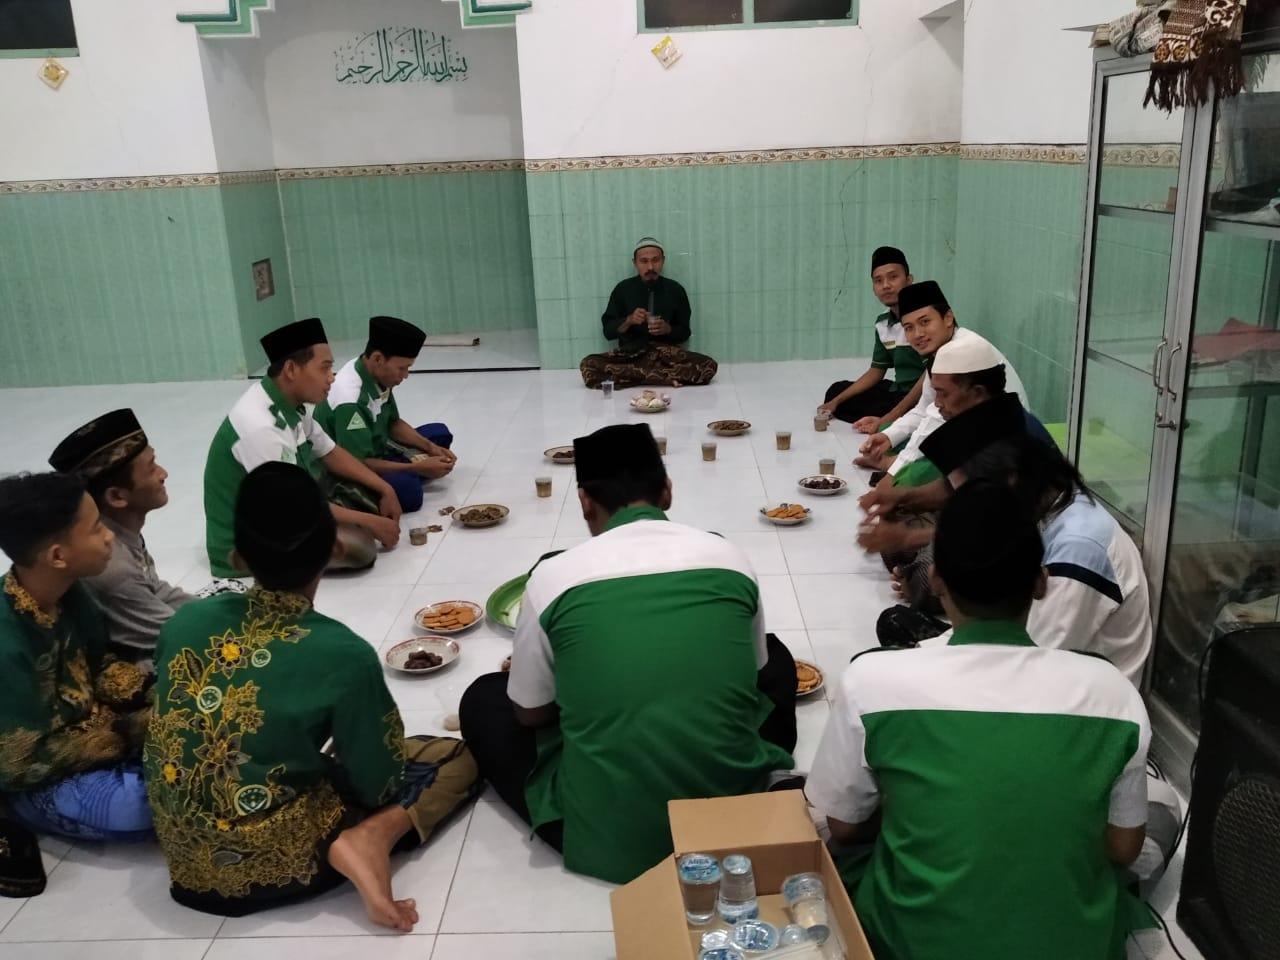 Jajaran pengurus PR GP Ansor dan IPNU Beton tengah membicarakan persiapan safari Ramadhan